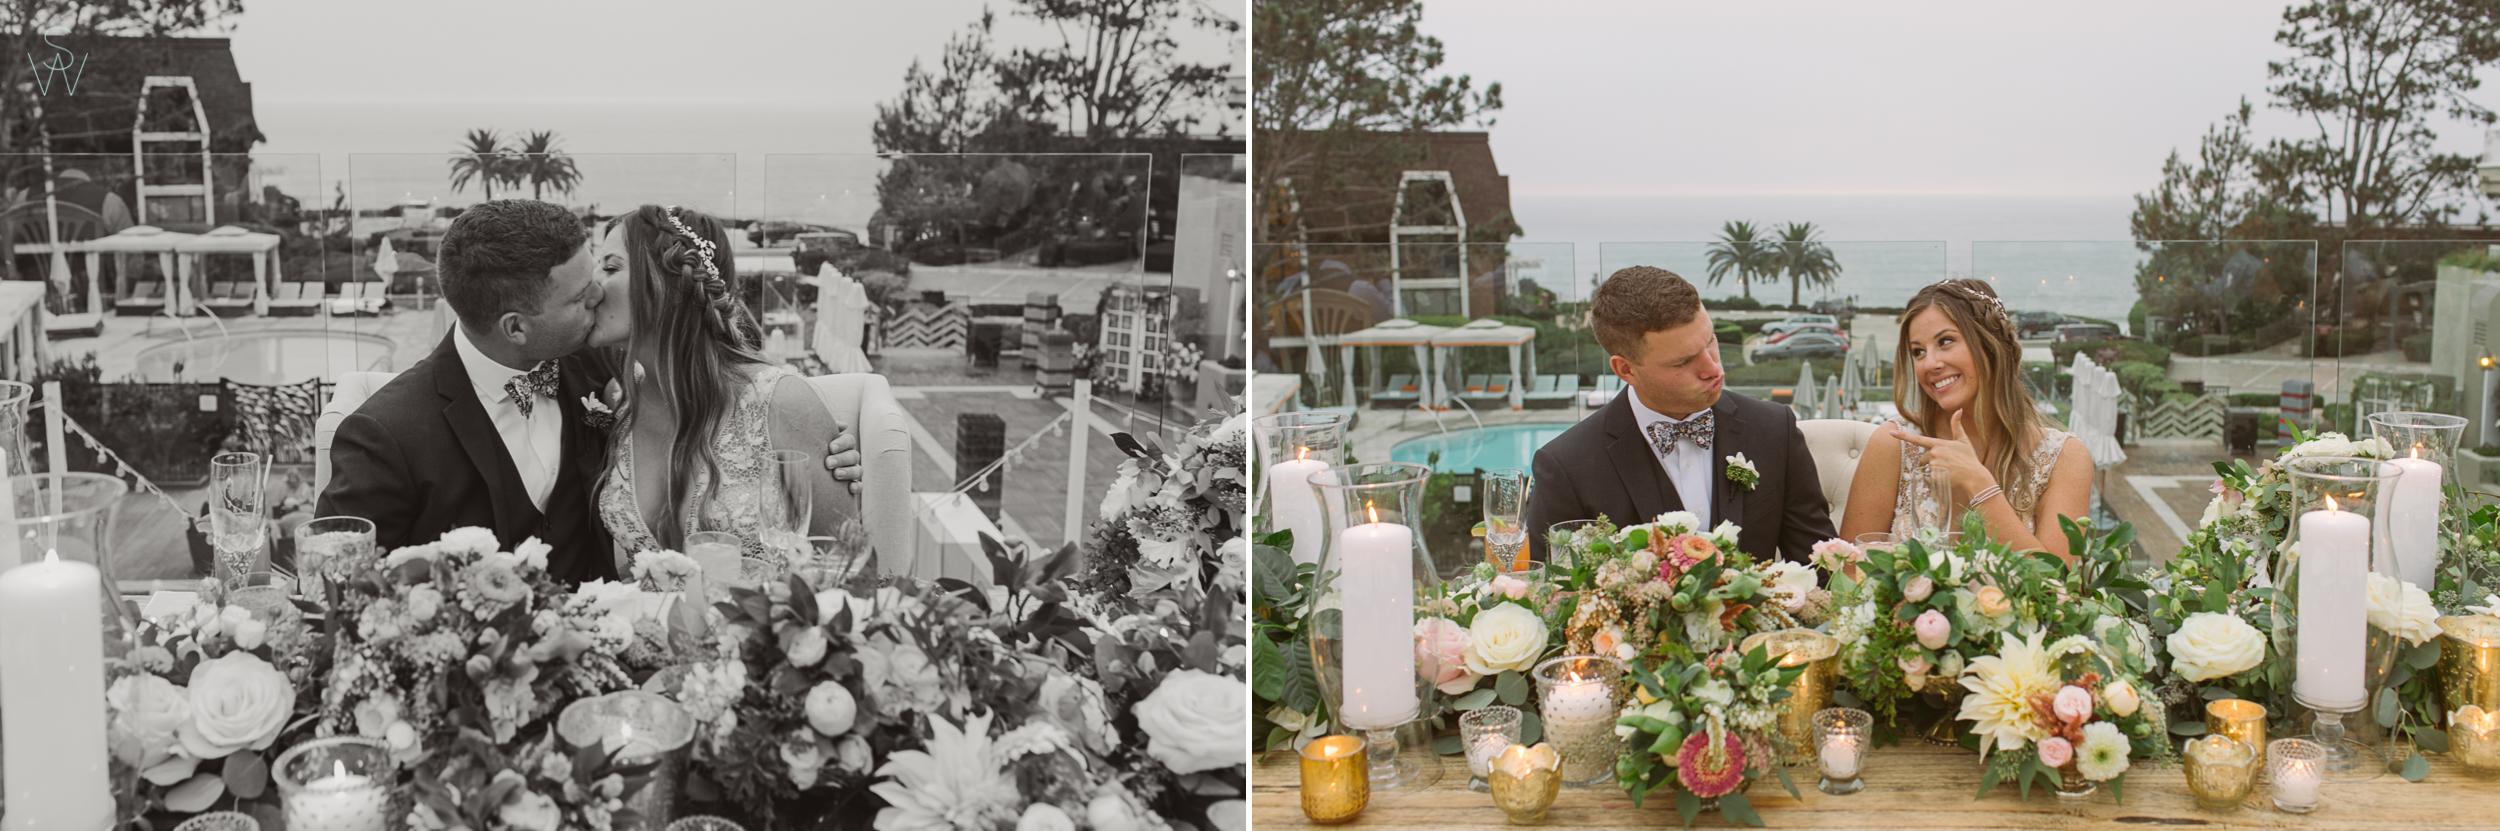 219Lauberge.shewanders.wedding.photography.JPG